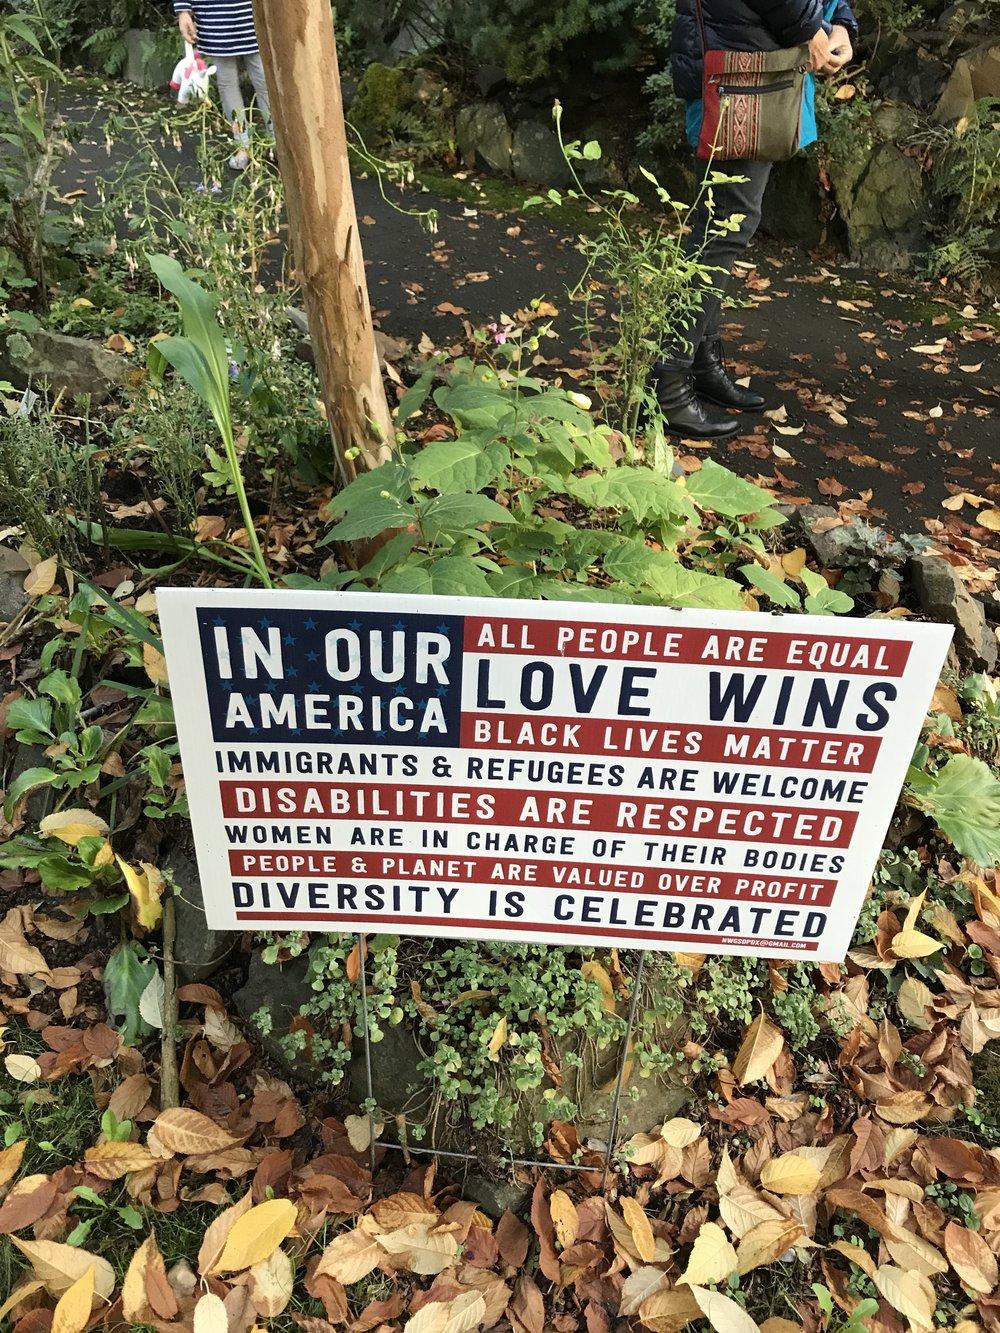 Yard sign, Kerns neighborhood, Portland, Oregon, Oct. 1, 2017.